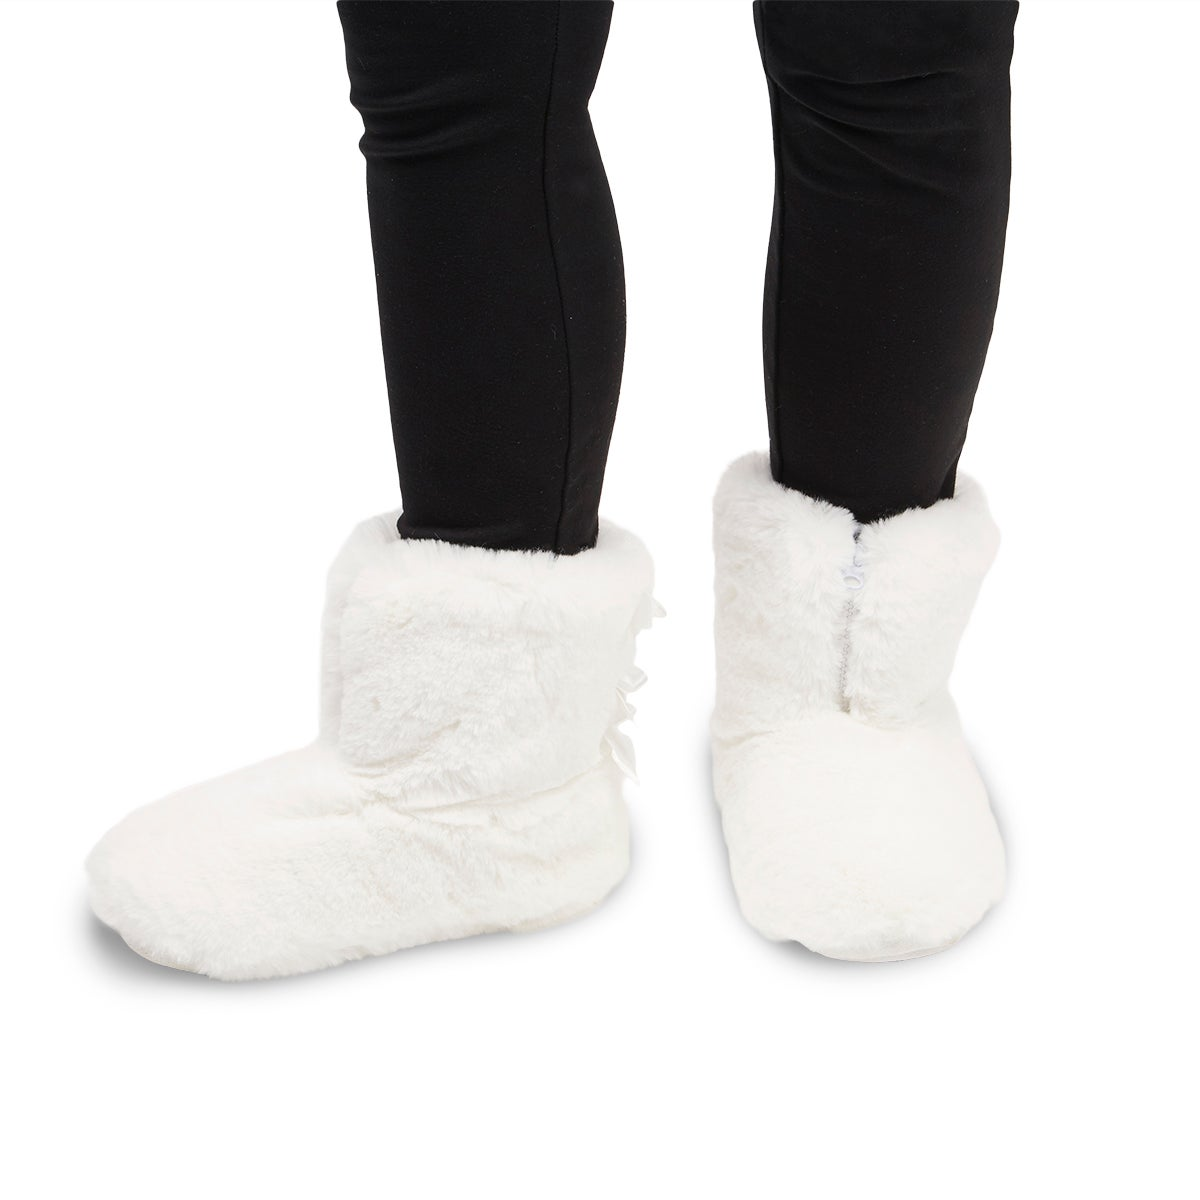 Lds Zippy 2.0 white  tall slipper